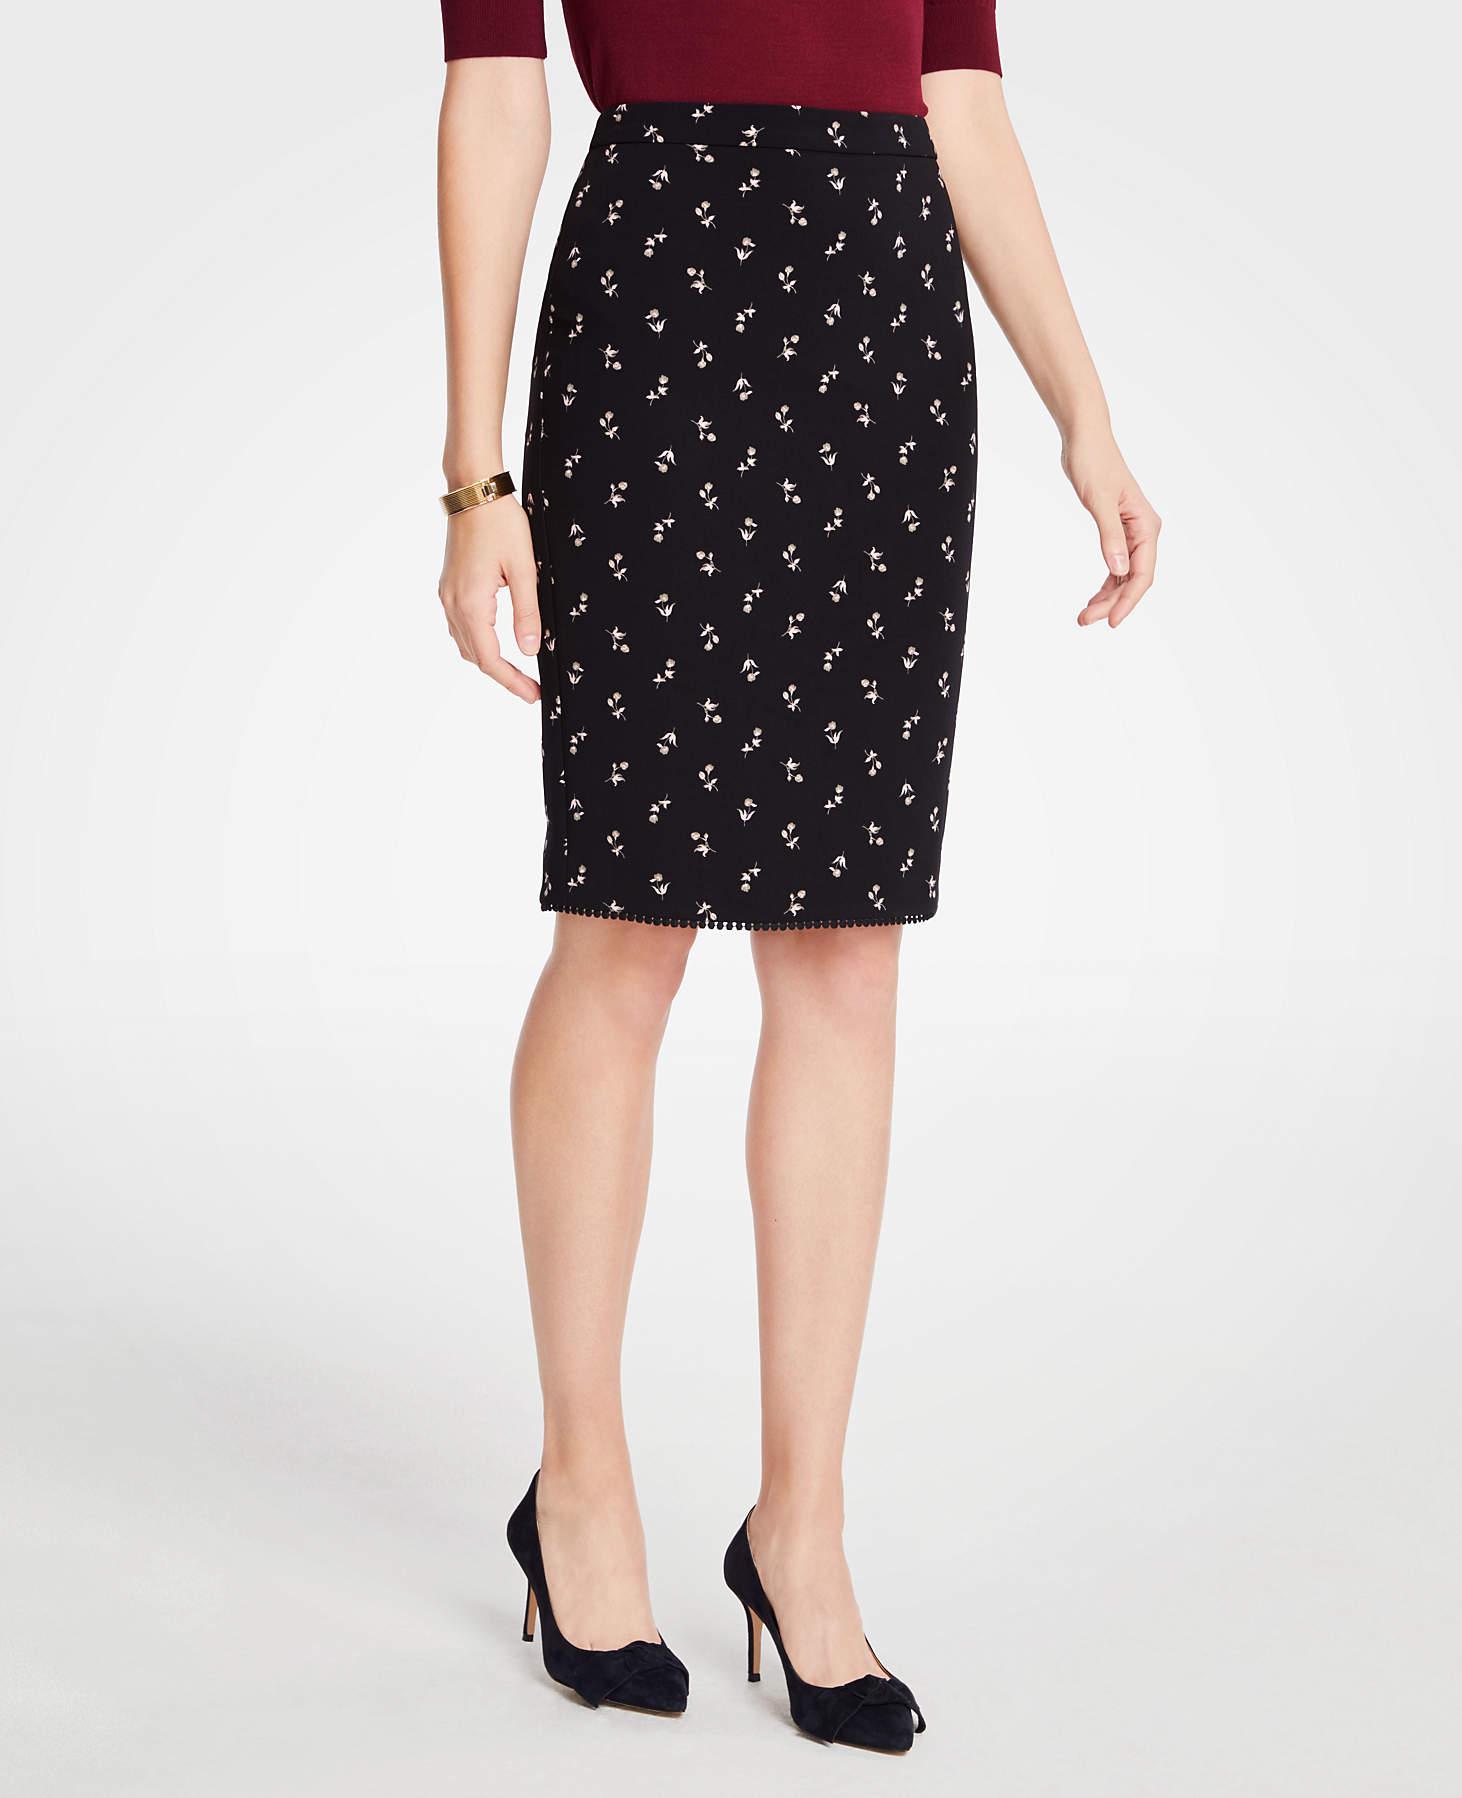 83e10dc7cc924c Ann Taylor Petite Floral Pencil Skirt in Black - Lyst